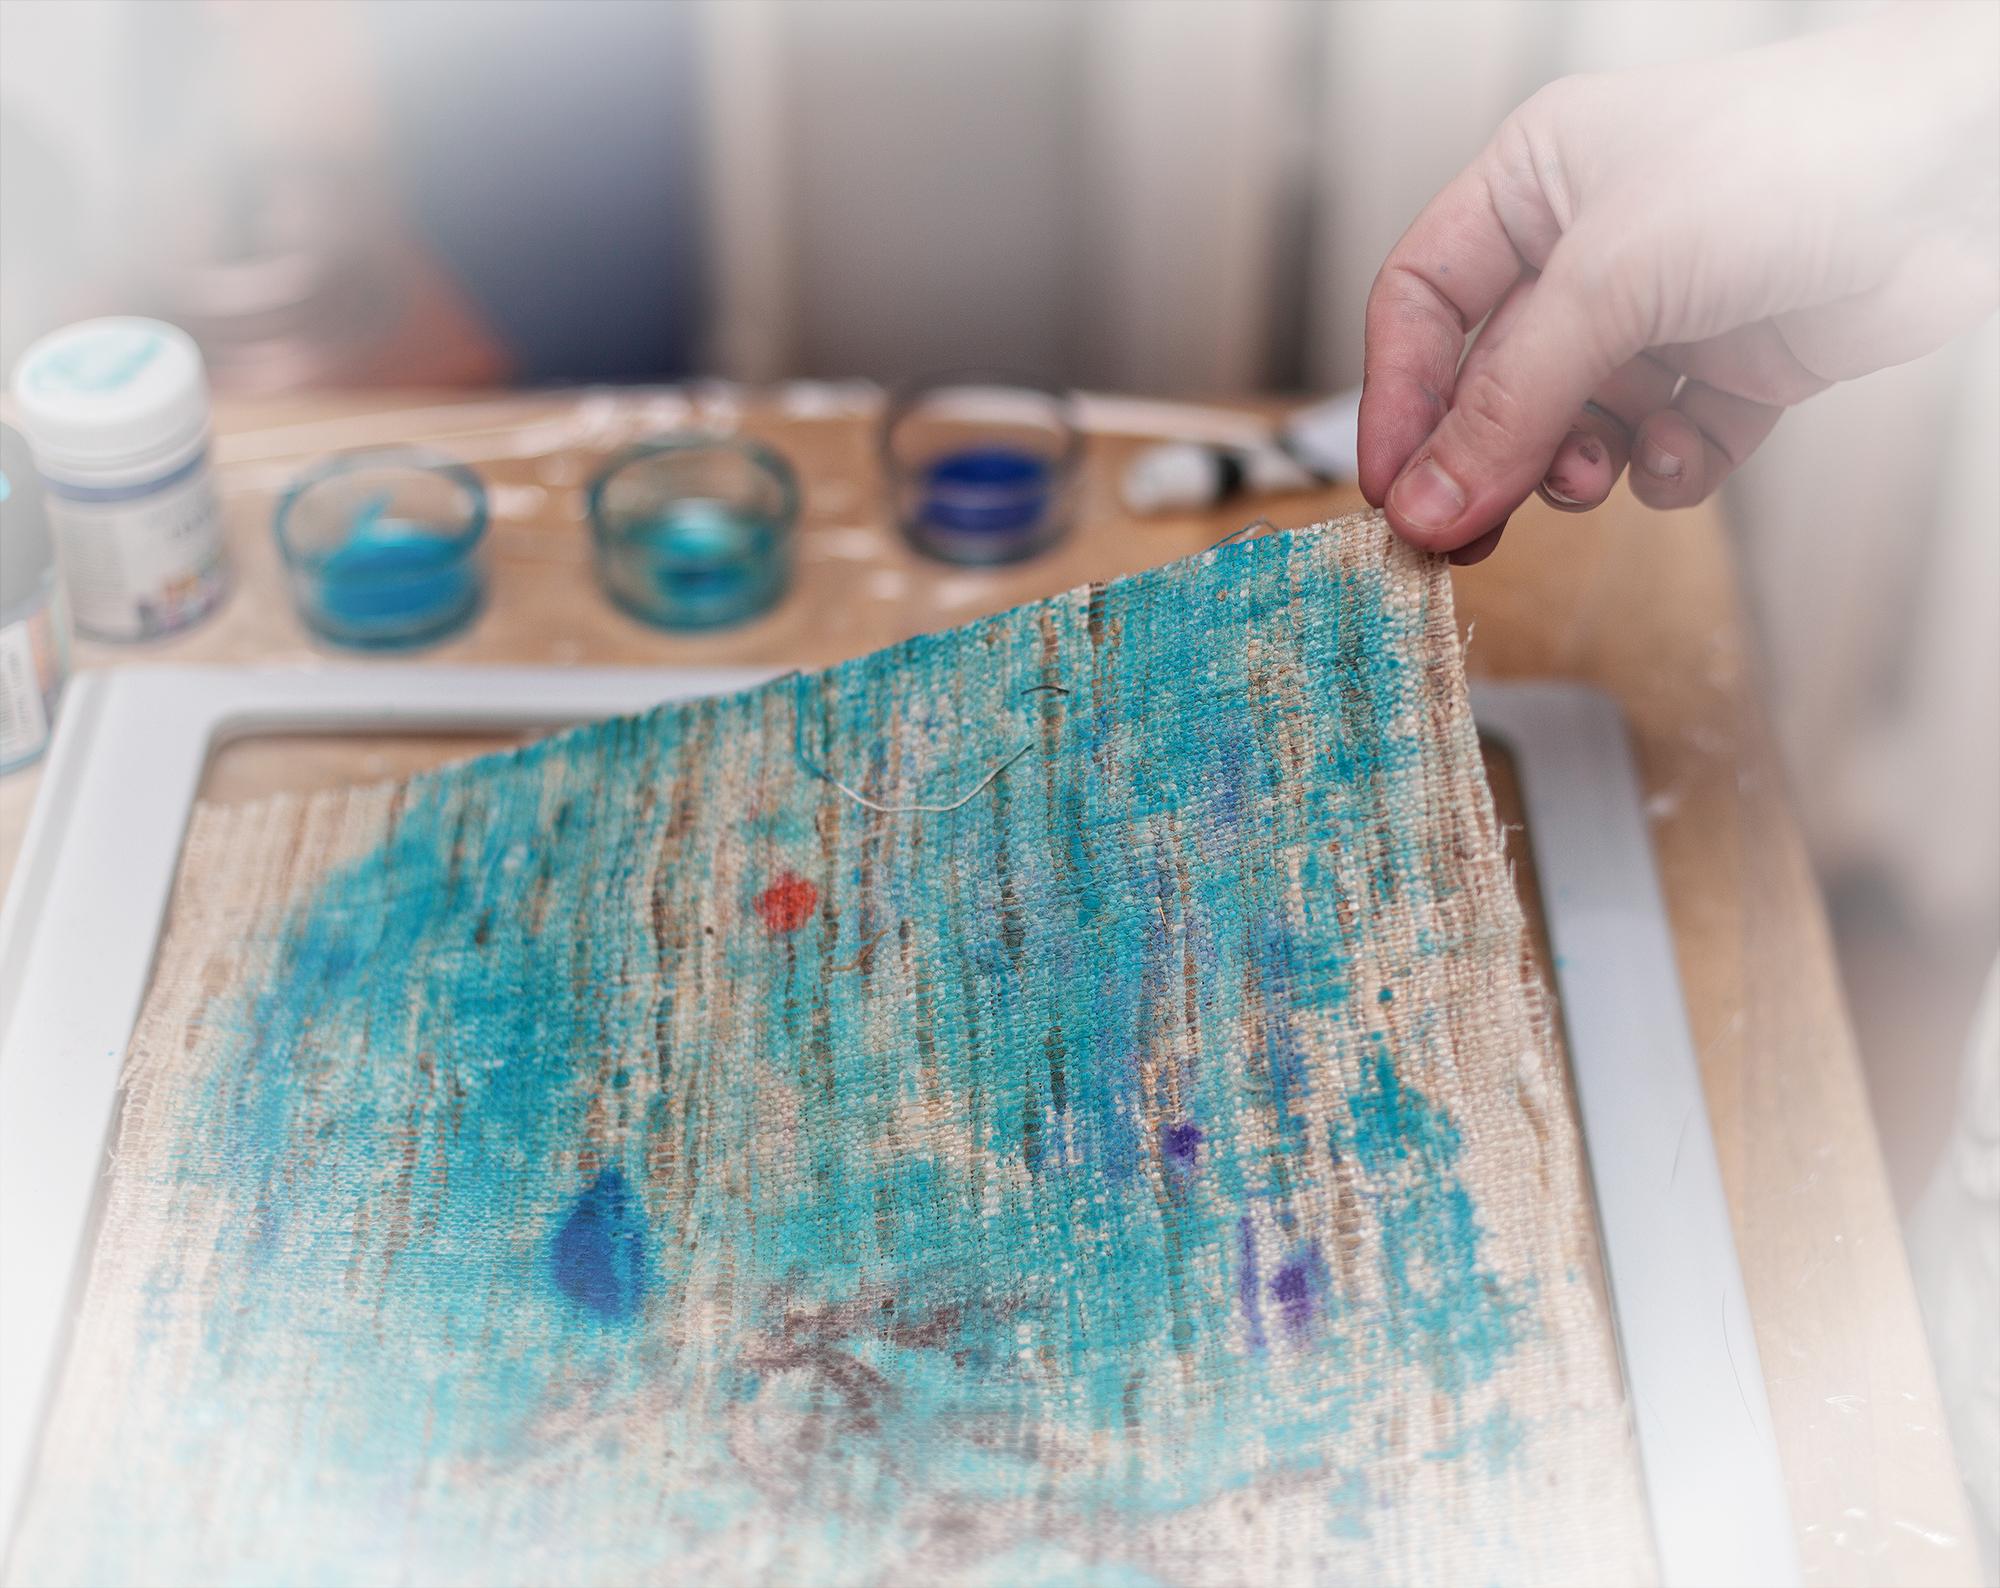 monotype, lesson, Master Class, silk, paint, workshop, hand print, монотипия, мастер-класс, семинар, урок, ручная печать, ткань, принт, шелк, рабочий процесс, work process, gravity, сила тяжести, first print, первый отпечаток